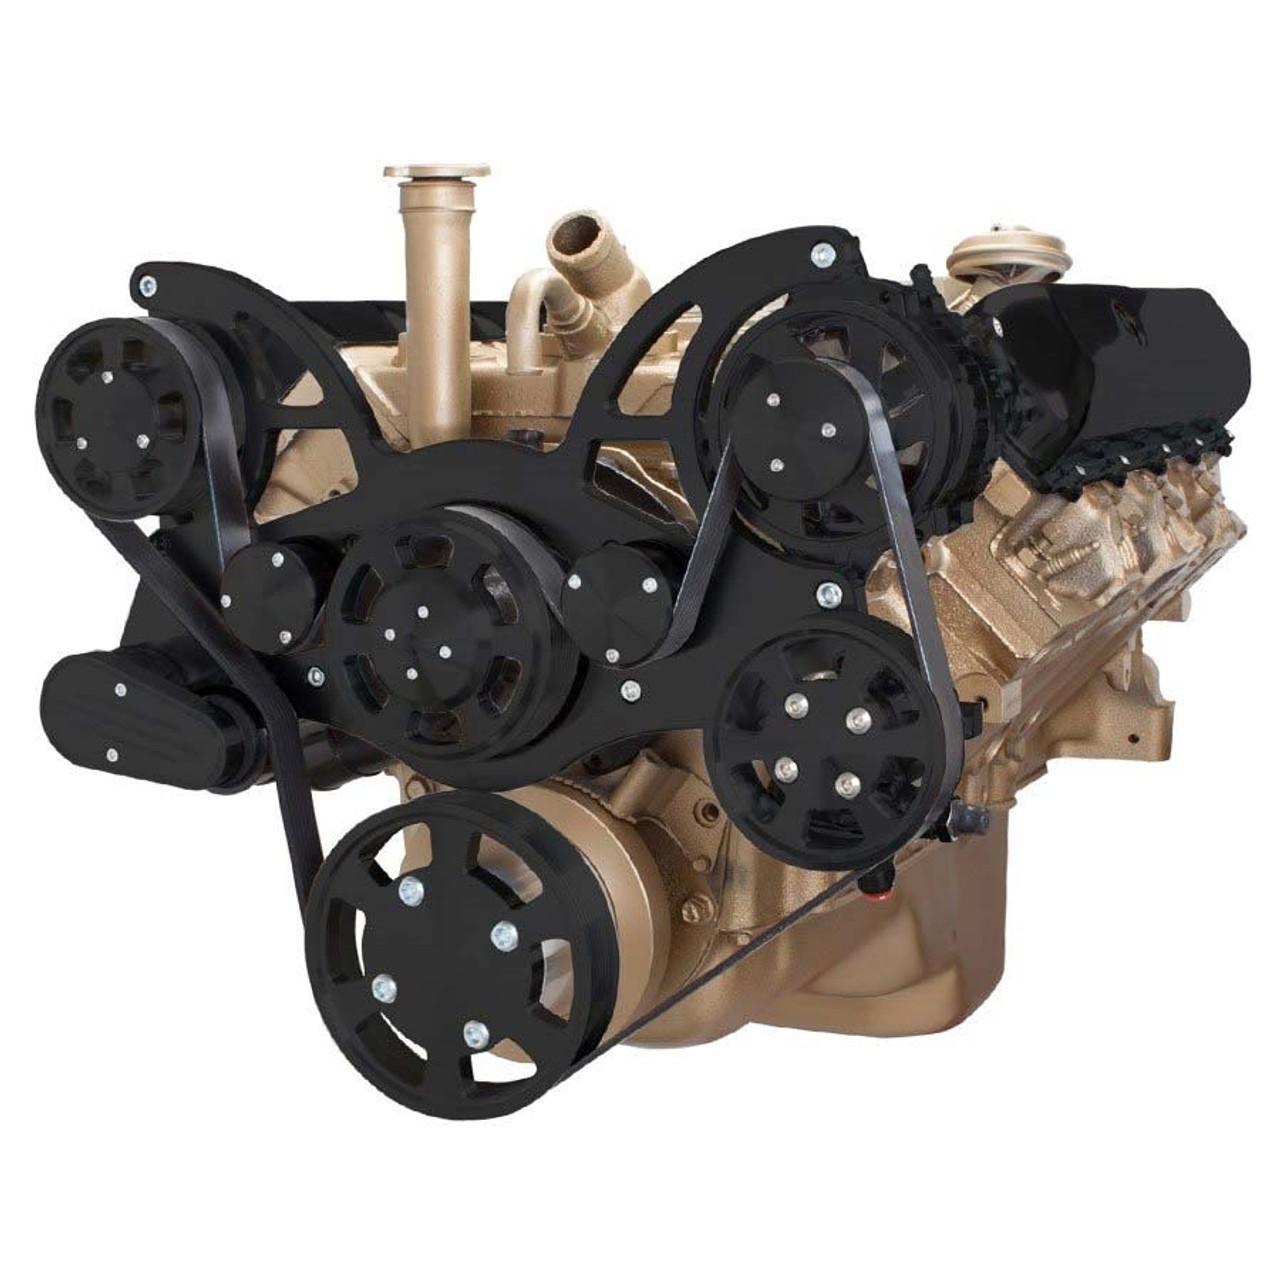 Stealth Black Serpentine Conversion Kit For Oldsmobile 350 455. Stealth Black Serpentine System For Oldsmobile 350455 Power Steering Alternator. Wiring. 455 Olds Engine Belt Diagram At Scoala.co